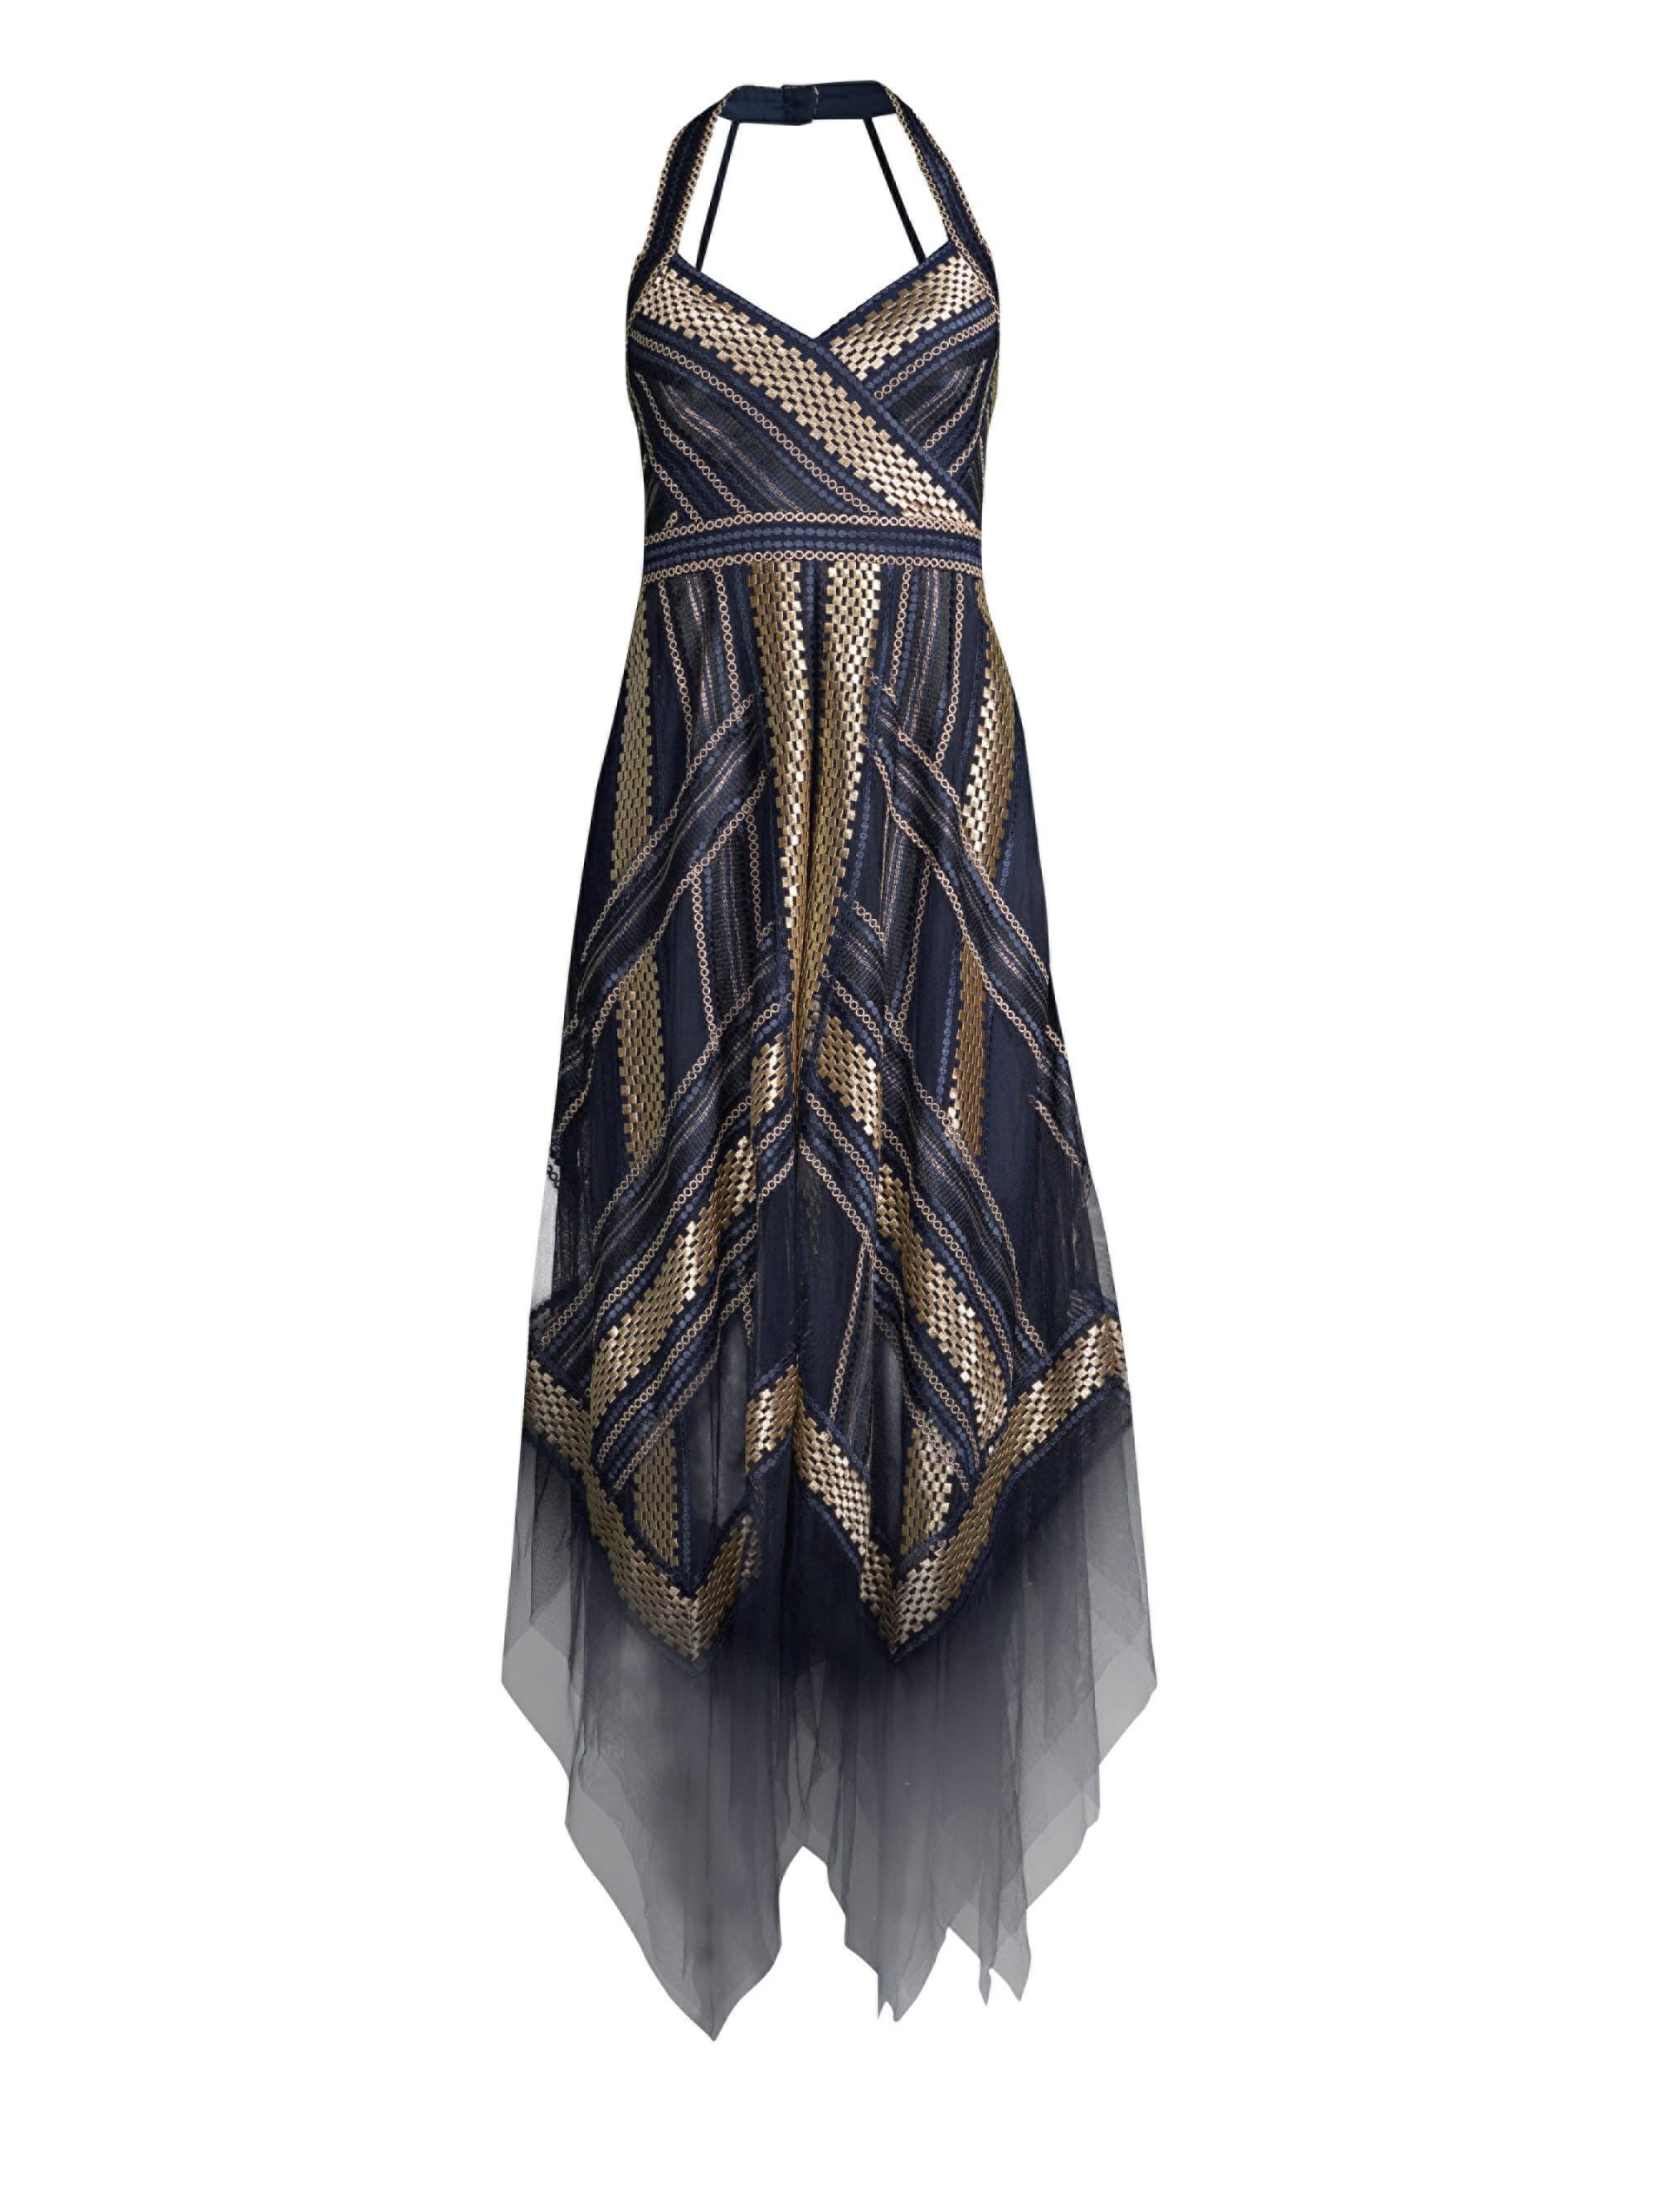 228a63787092 BCBGMAXAZRIA Women's Metallic Striped Handkerchief Dress - Navy ...